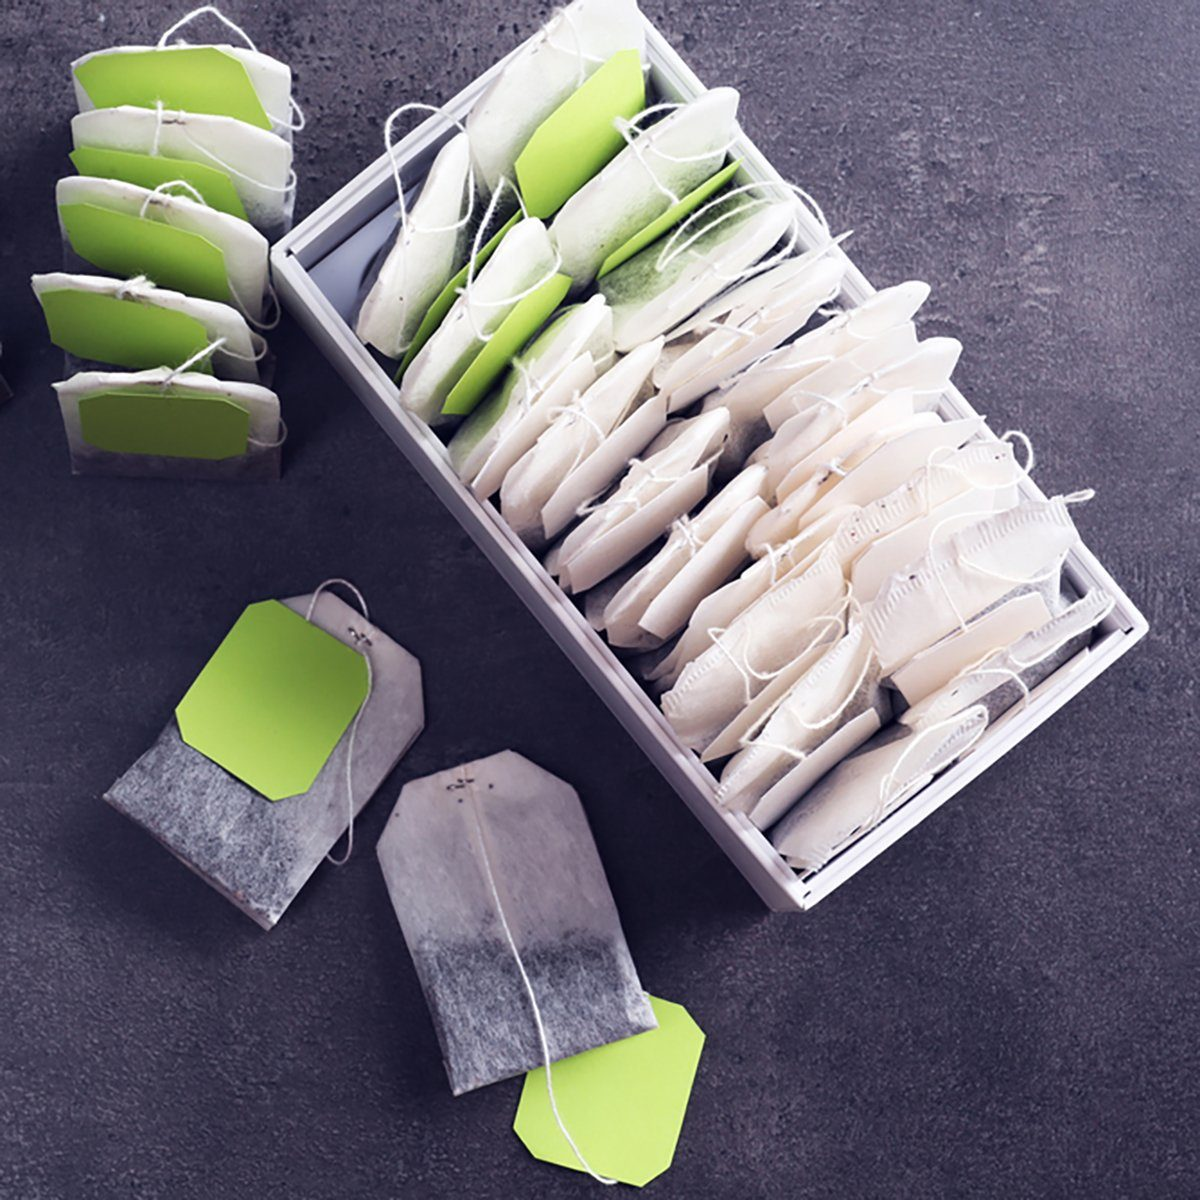 Tea bags in box